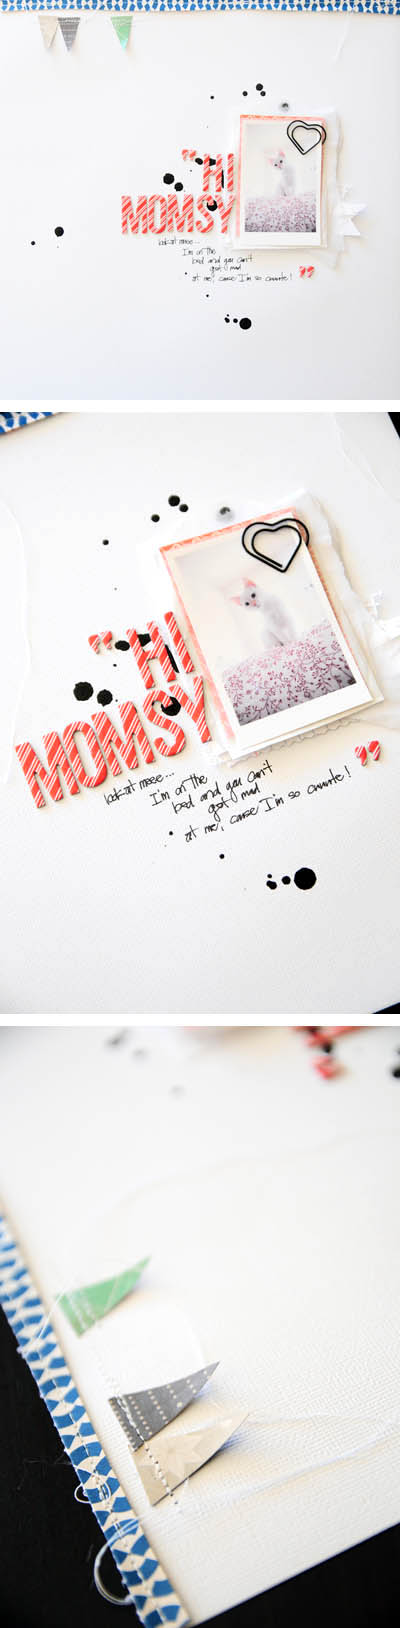 Rahel Menig #scrapbooking | scrapbook inspiration | Pinterest ...